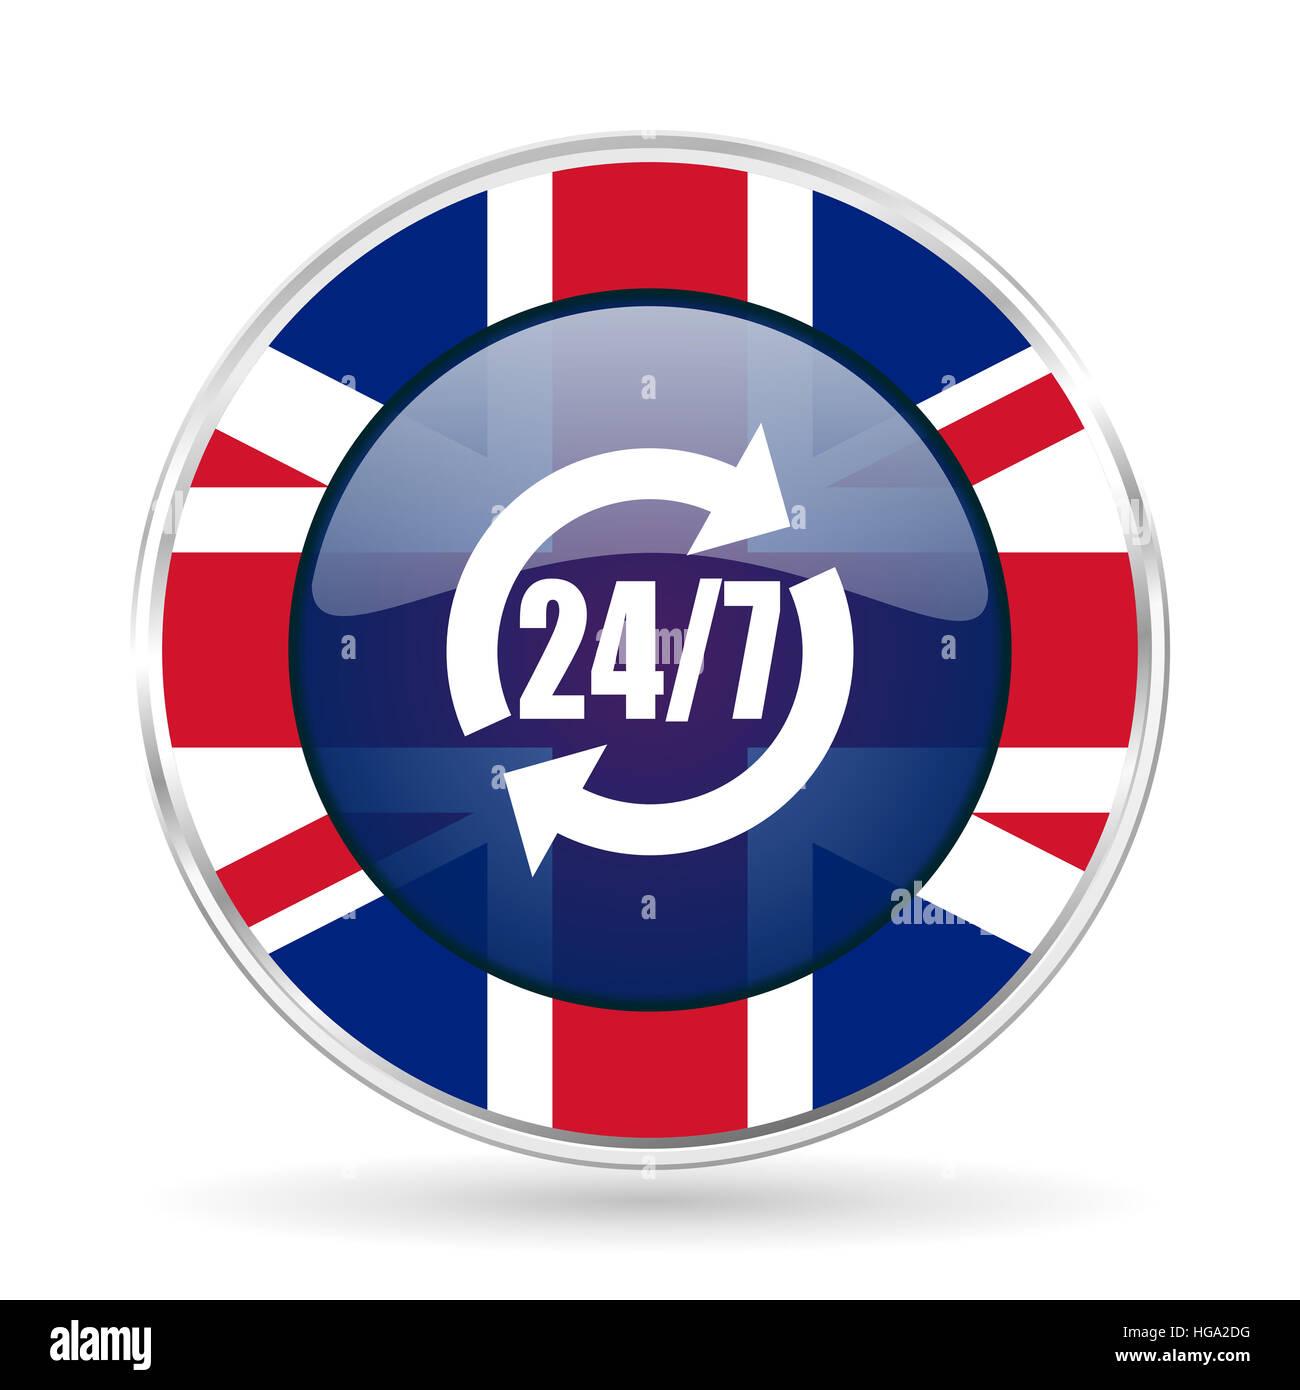 Service british design icon - round silver metallic border button with Great Britain flag - Stock Image